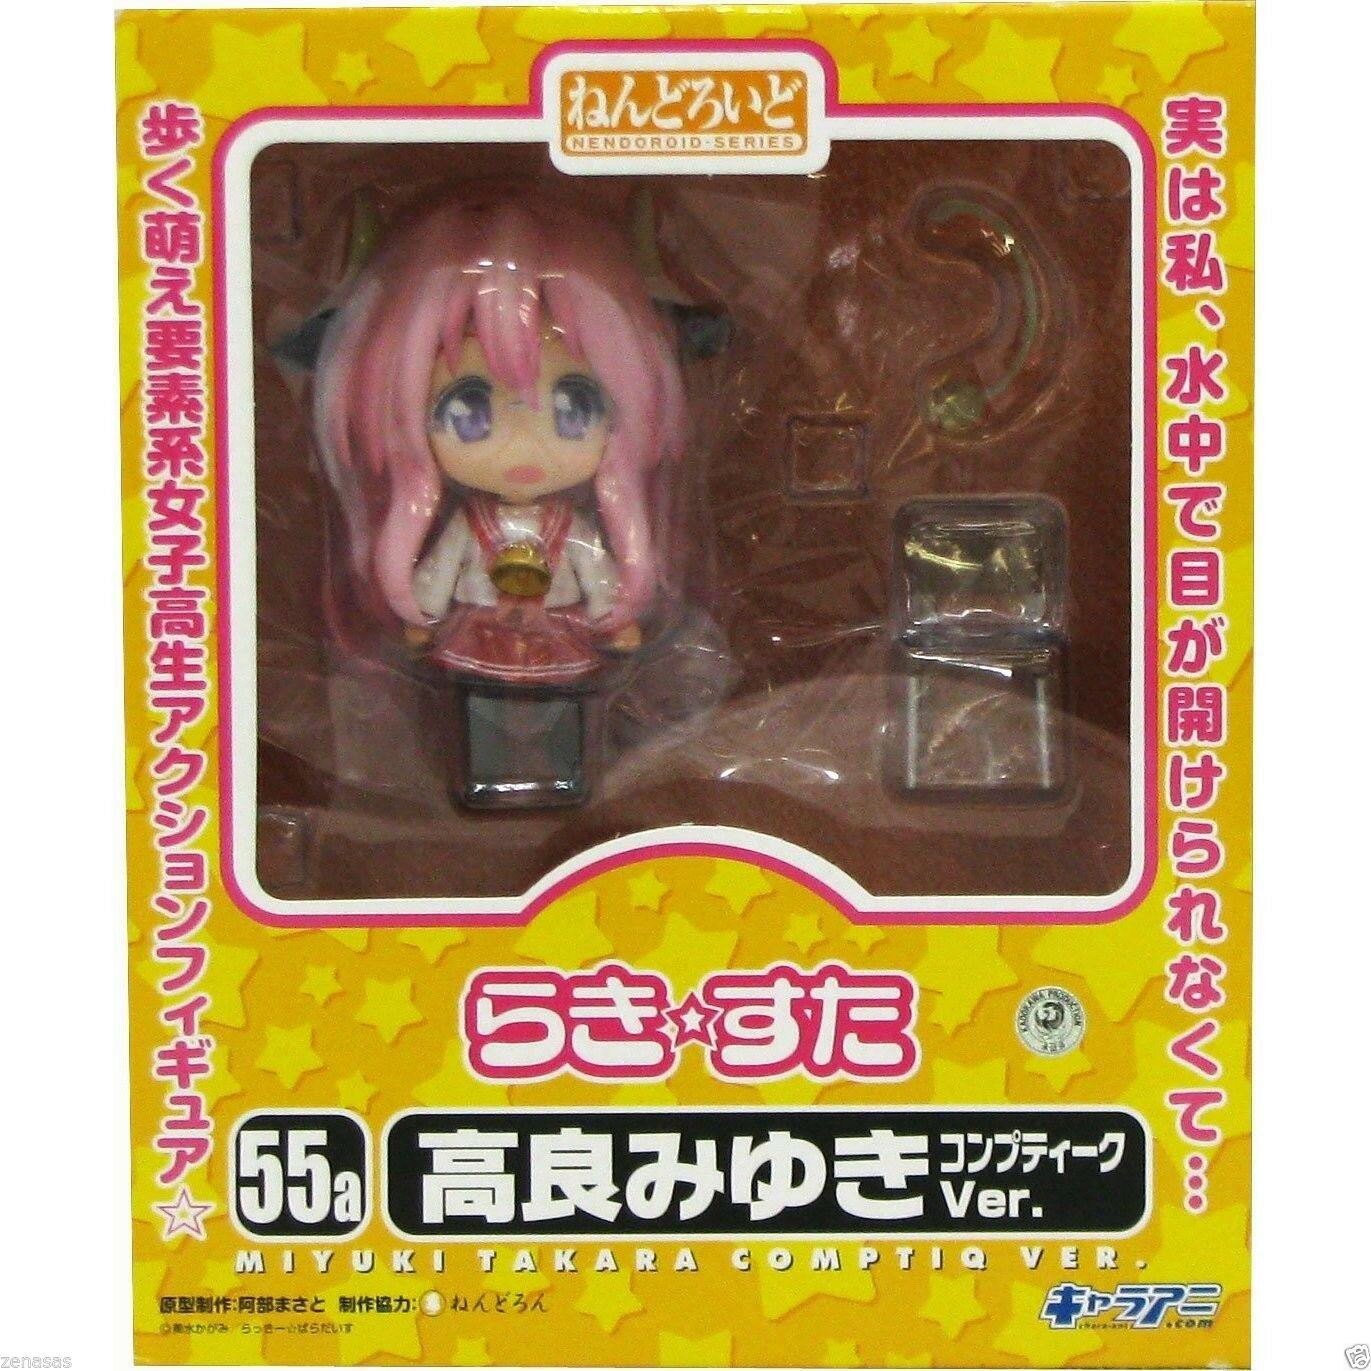 Miyuki Takara Figure, Nendoroid Series 55b, Lucky Star, Good Smile Company